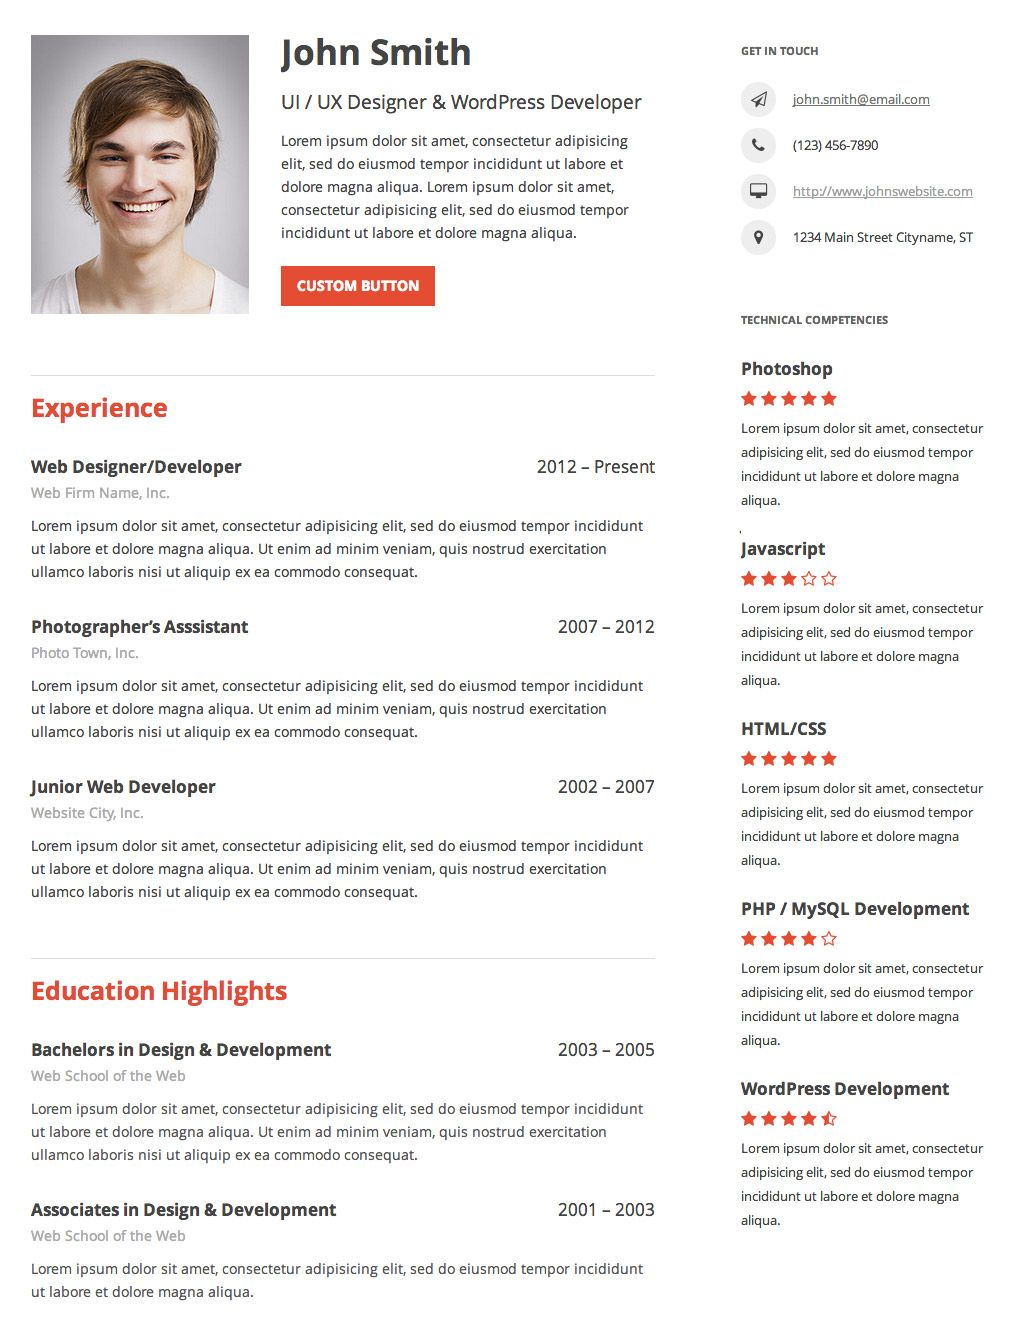 Resume Builder Plugin for Wordpress